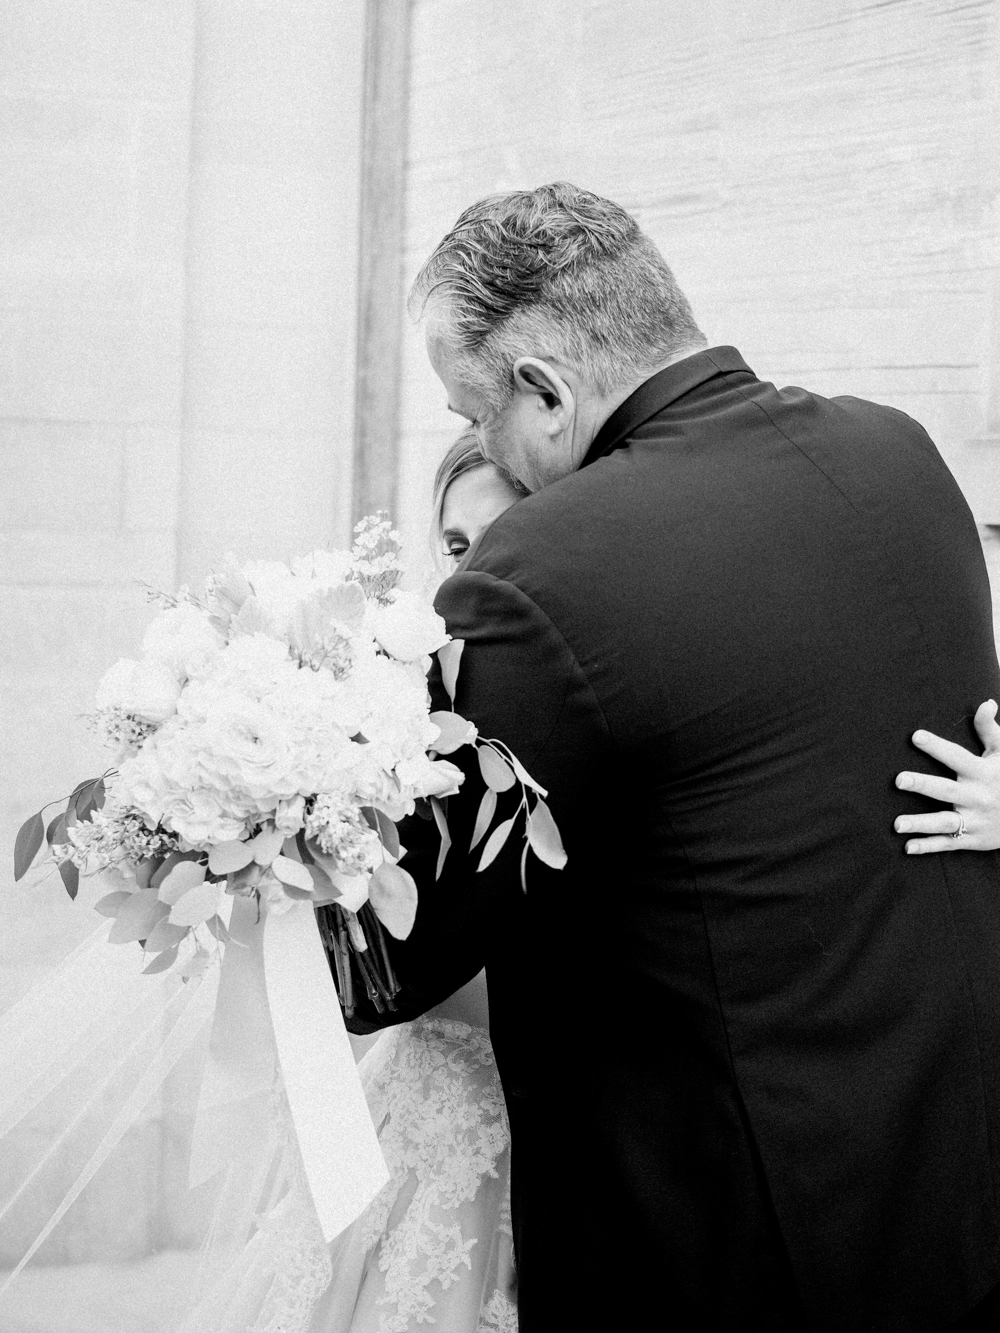 Houston wedding photographer - Christine Gosch - Houston film photographer - greek wedding in Houston - Annunciation Greek Orthodox church in Houston, Texas - Houston wedding planner -62.jpg